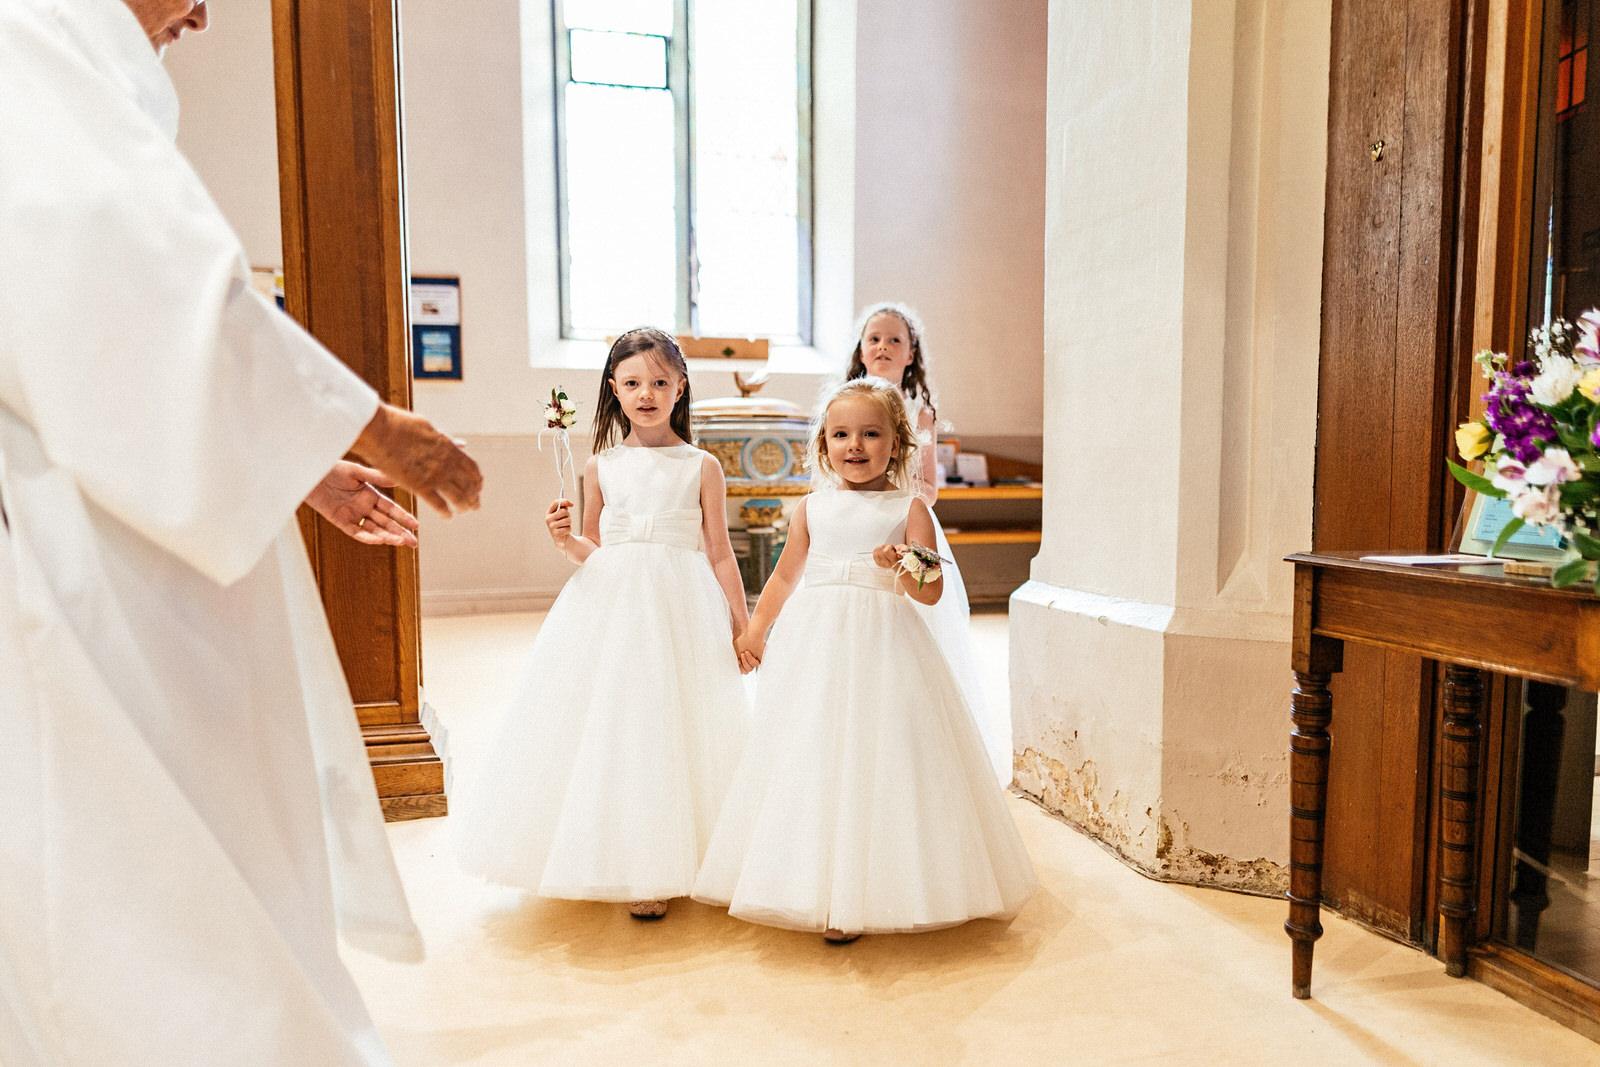 Beamish-Hall-Wedding-Photographer-015.jpg